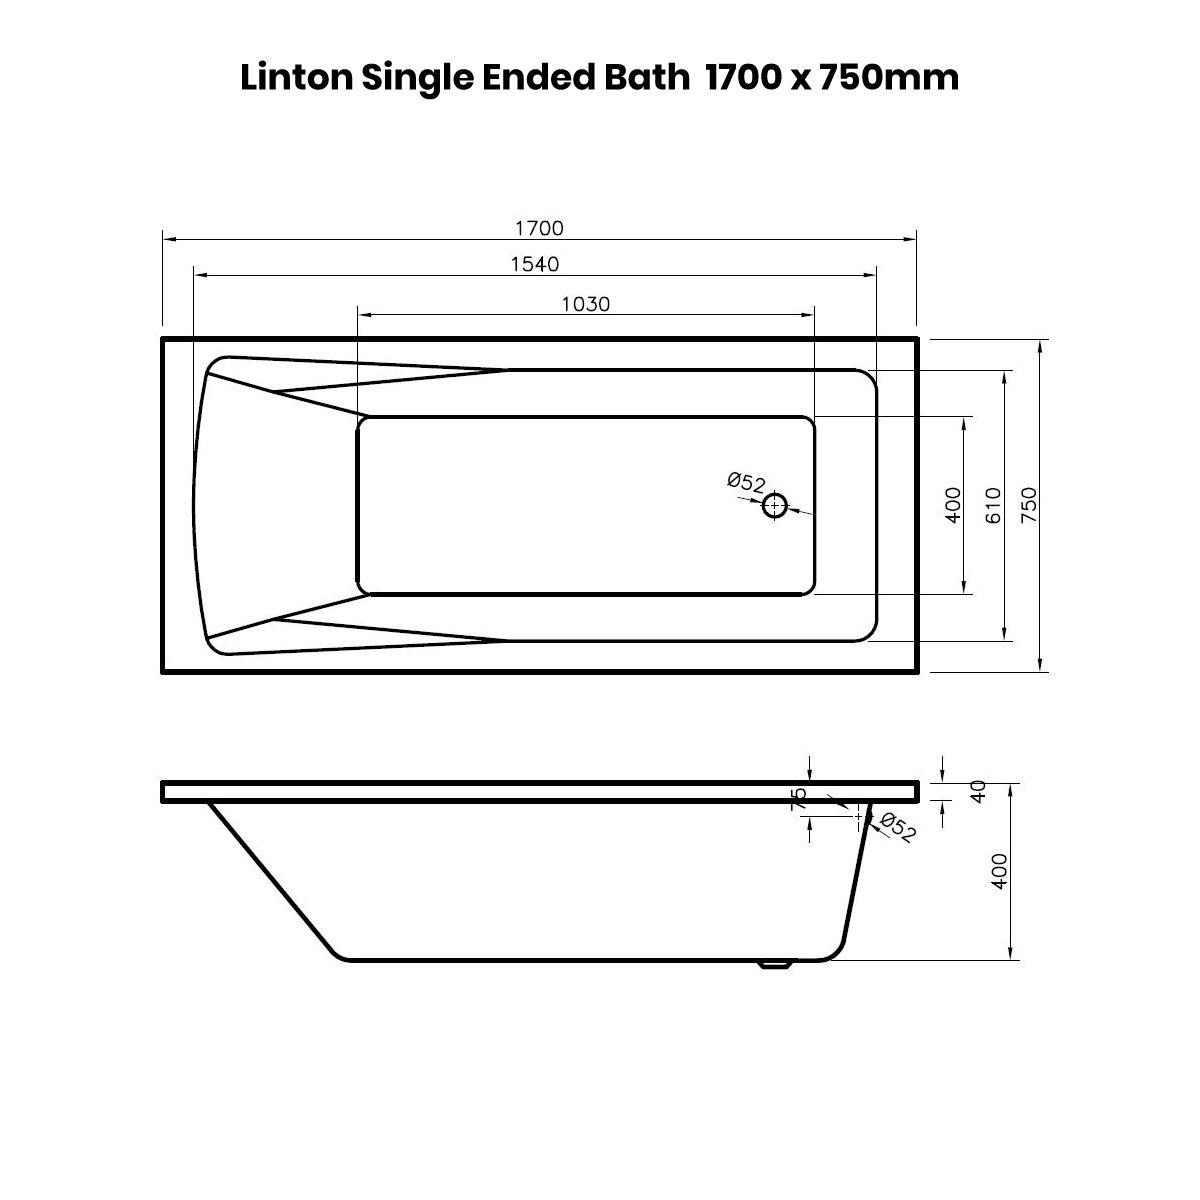 Premier Linton Single Ended Bath 1700 x 750mm Dimensions